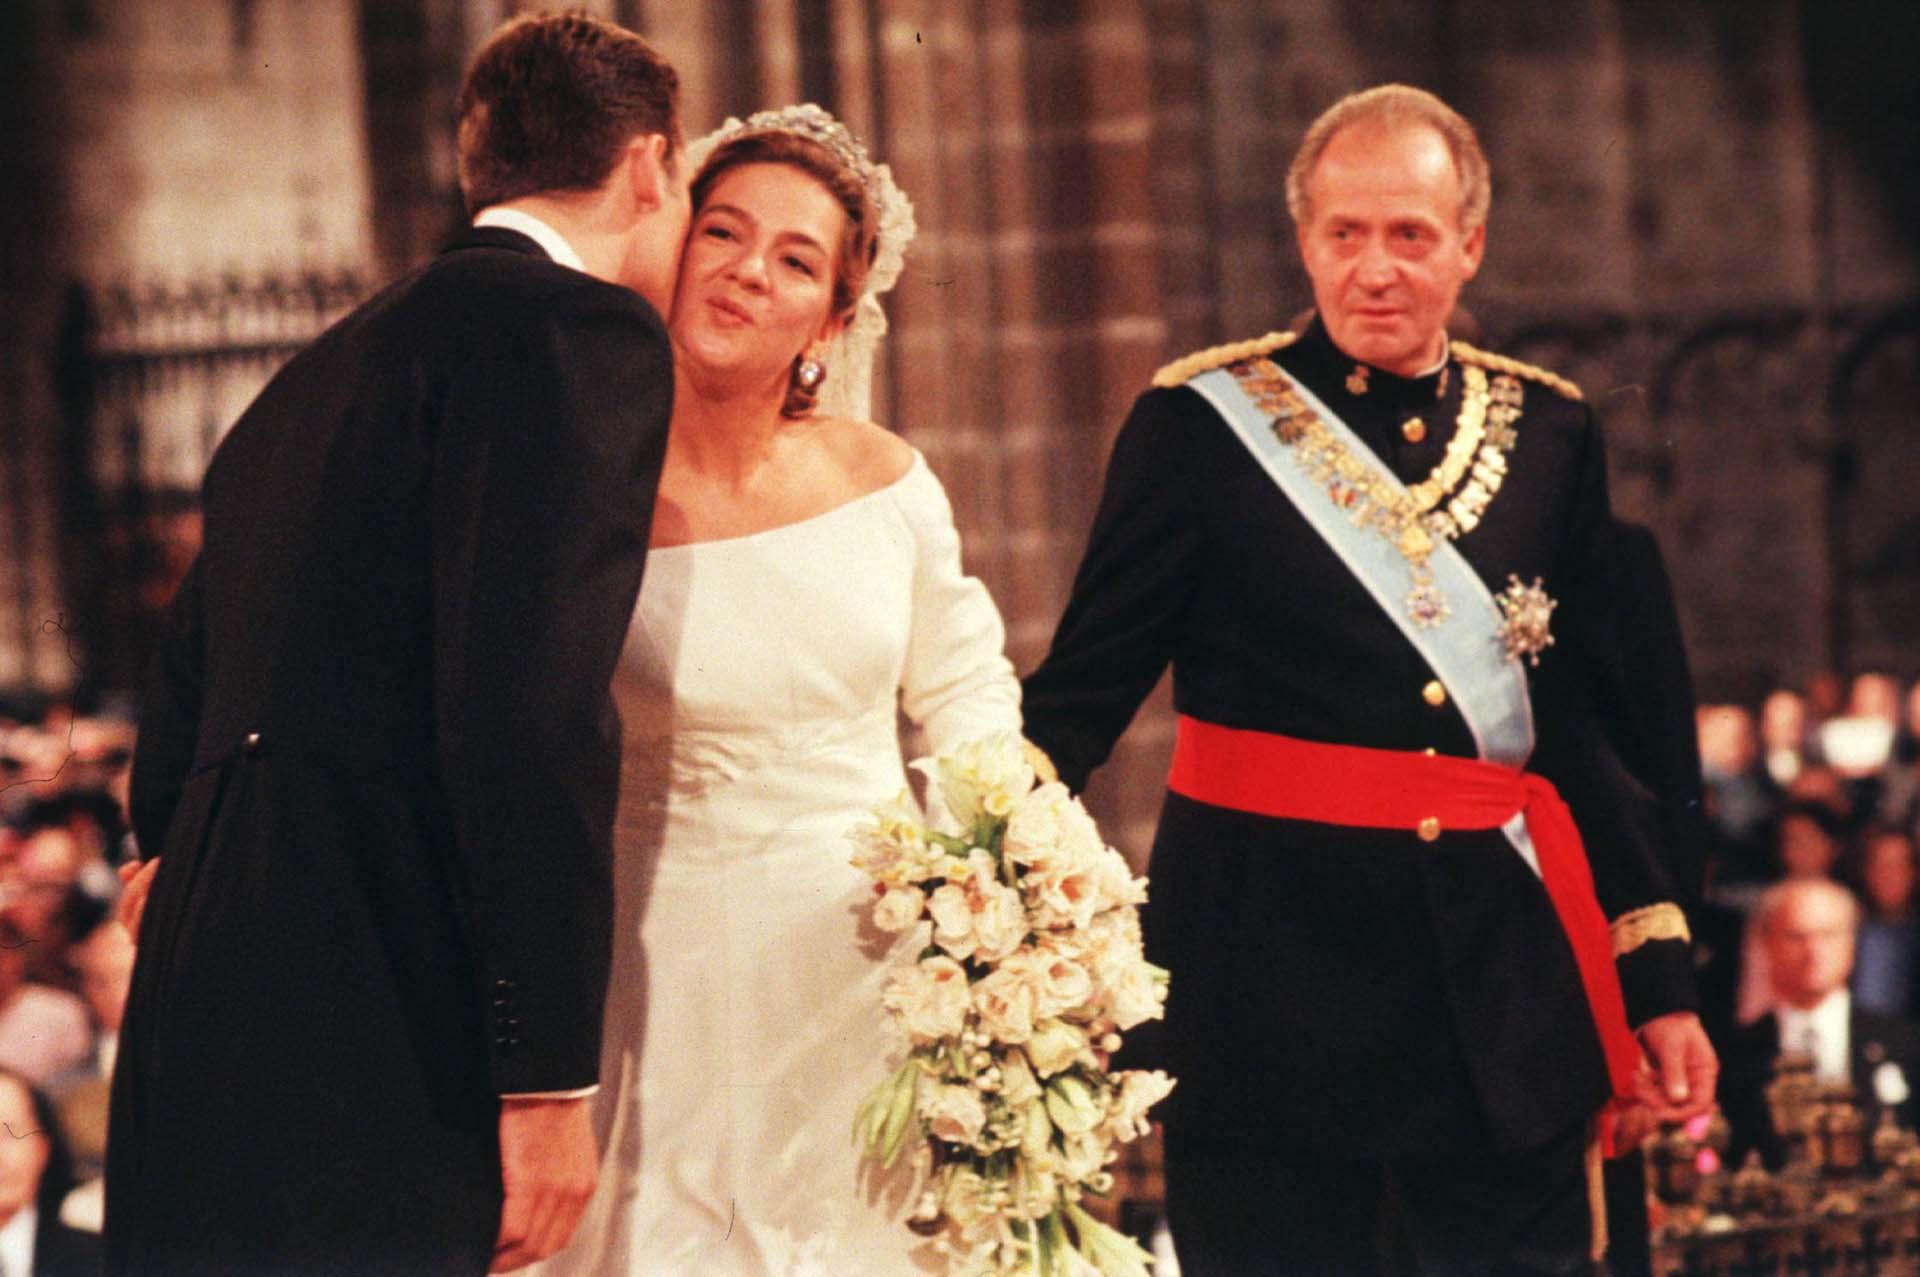 Otra boda real: la de la infanta Cristina con Iñaki Urdangarín, en Barcelona, en 1997 (Shutterstock)